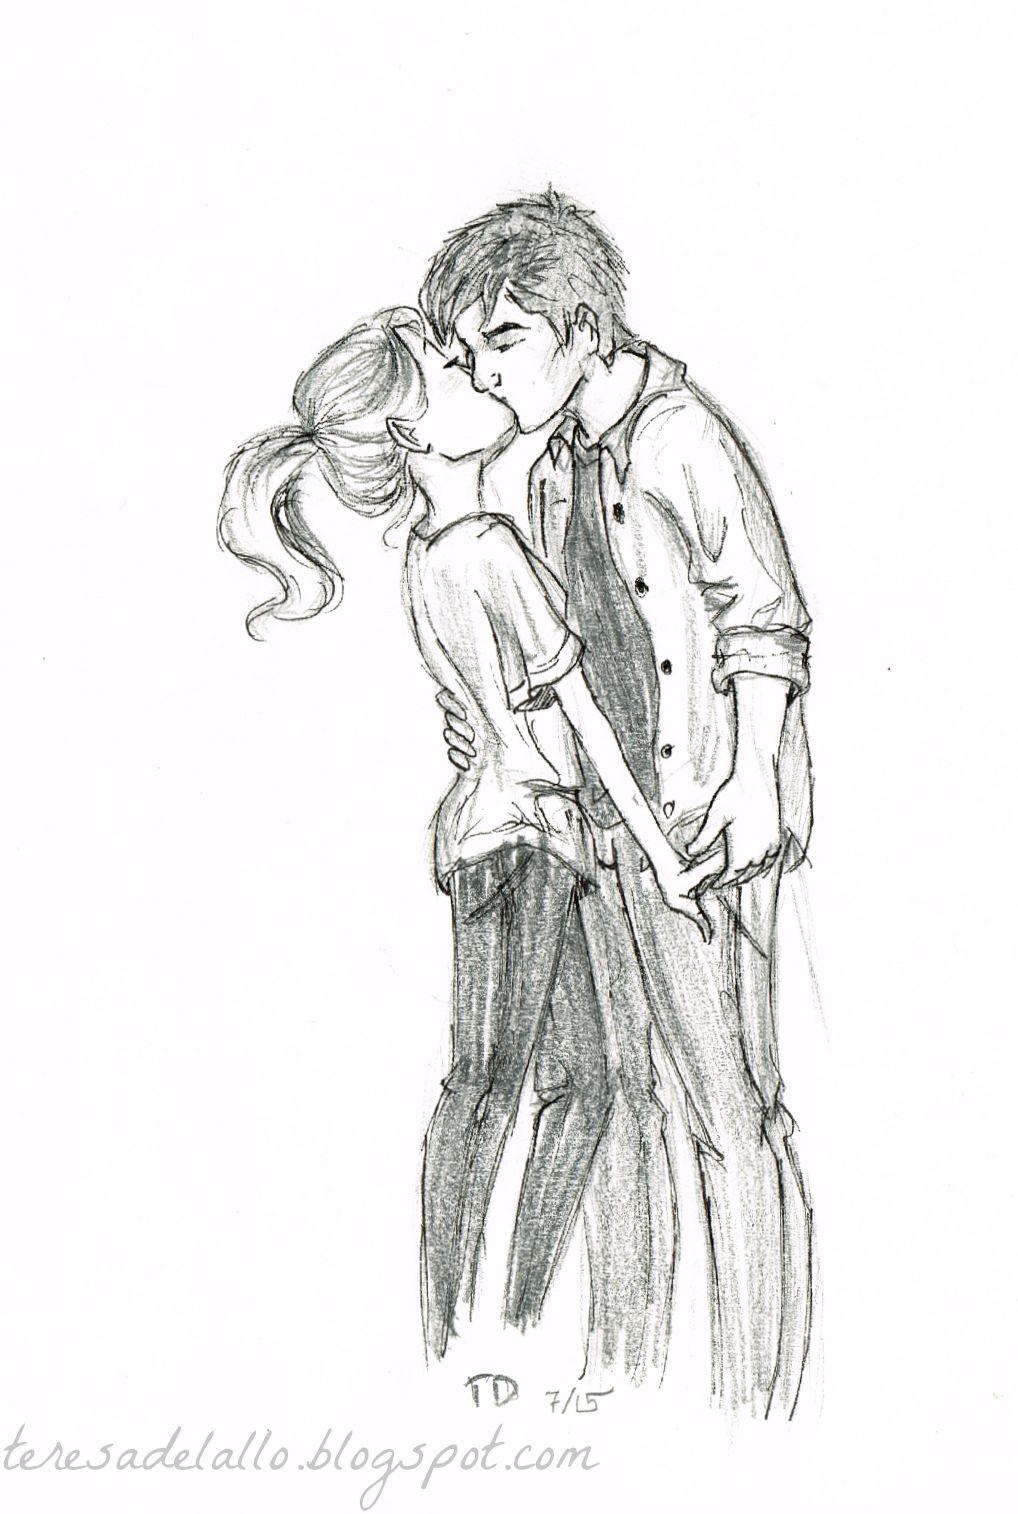 Drawn kissing Just  black really a